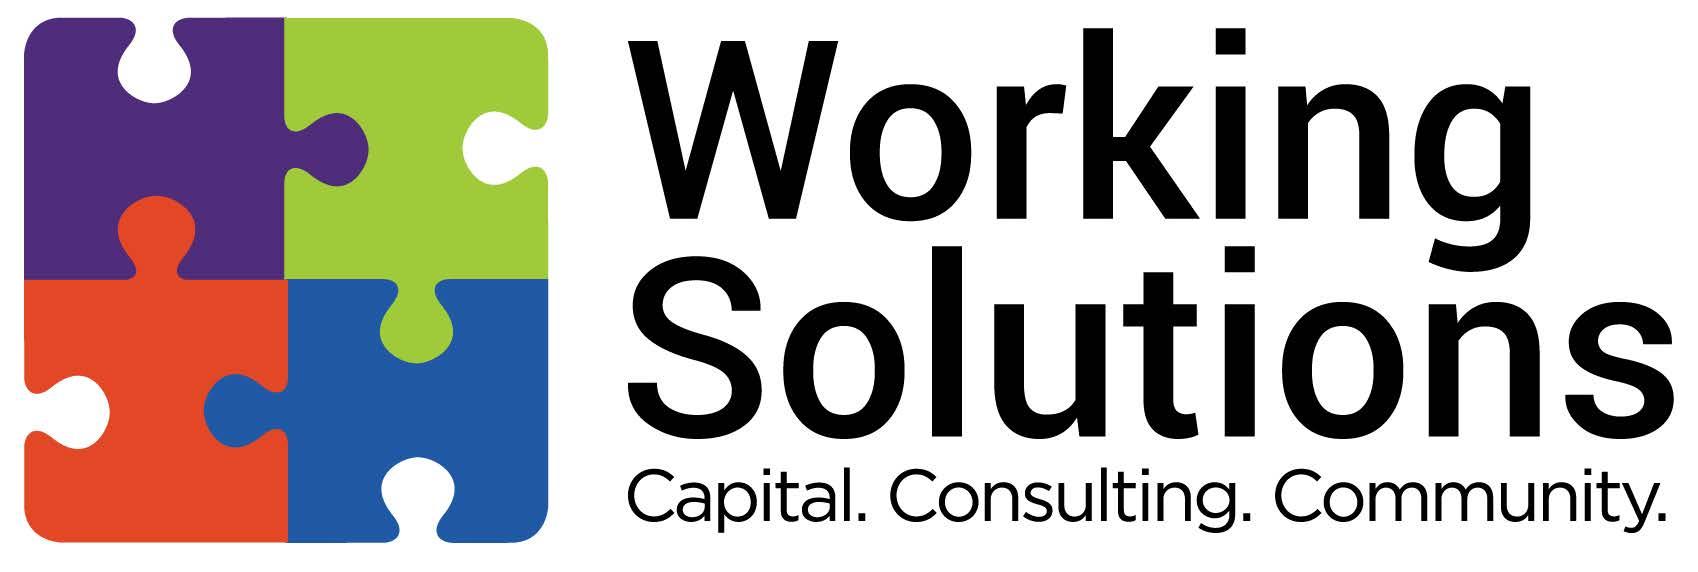 _workingsolution_final1-cropped.jpg